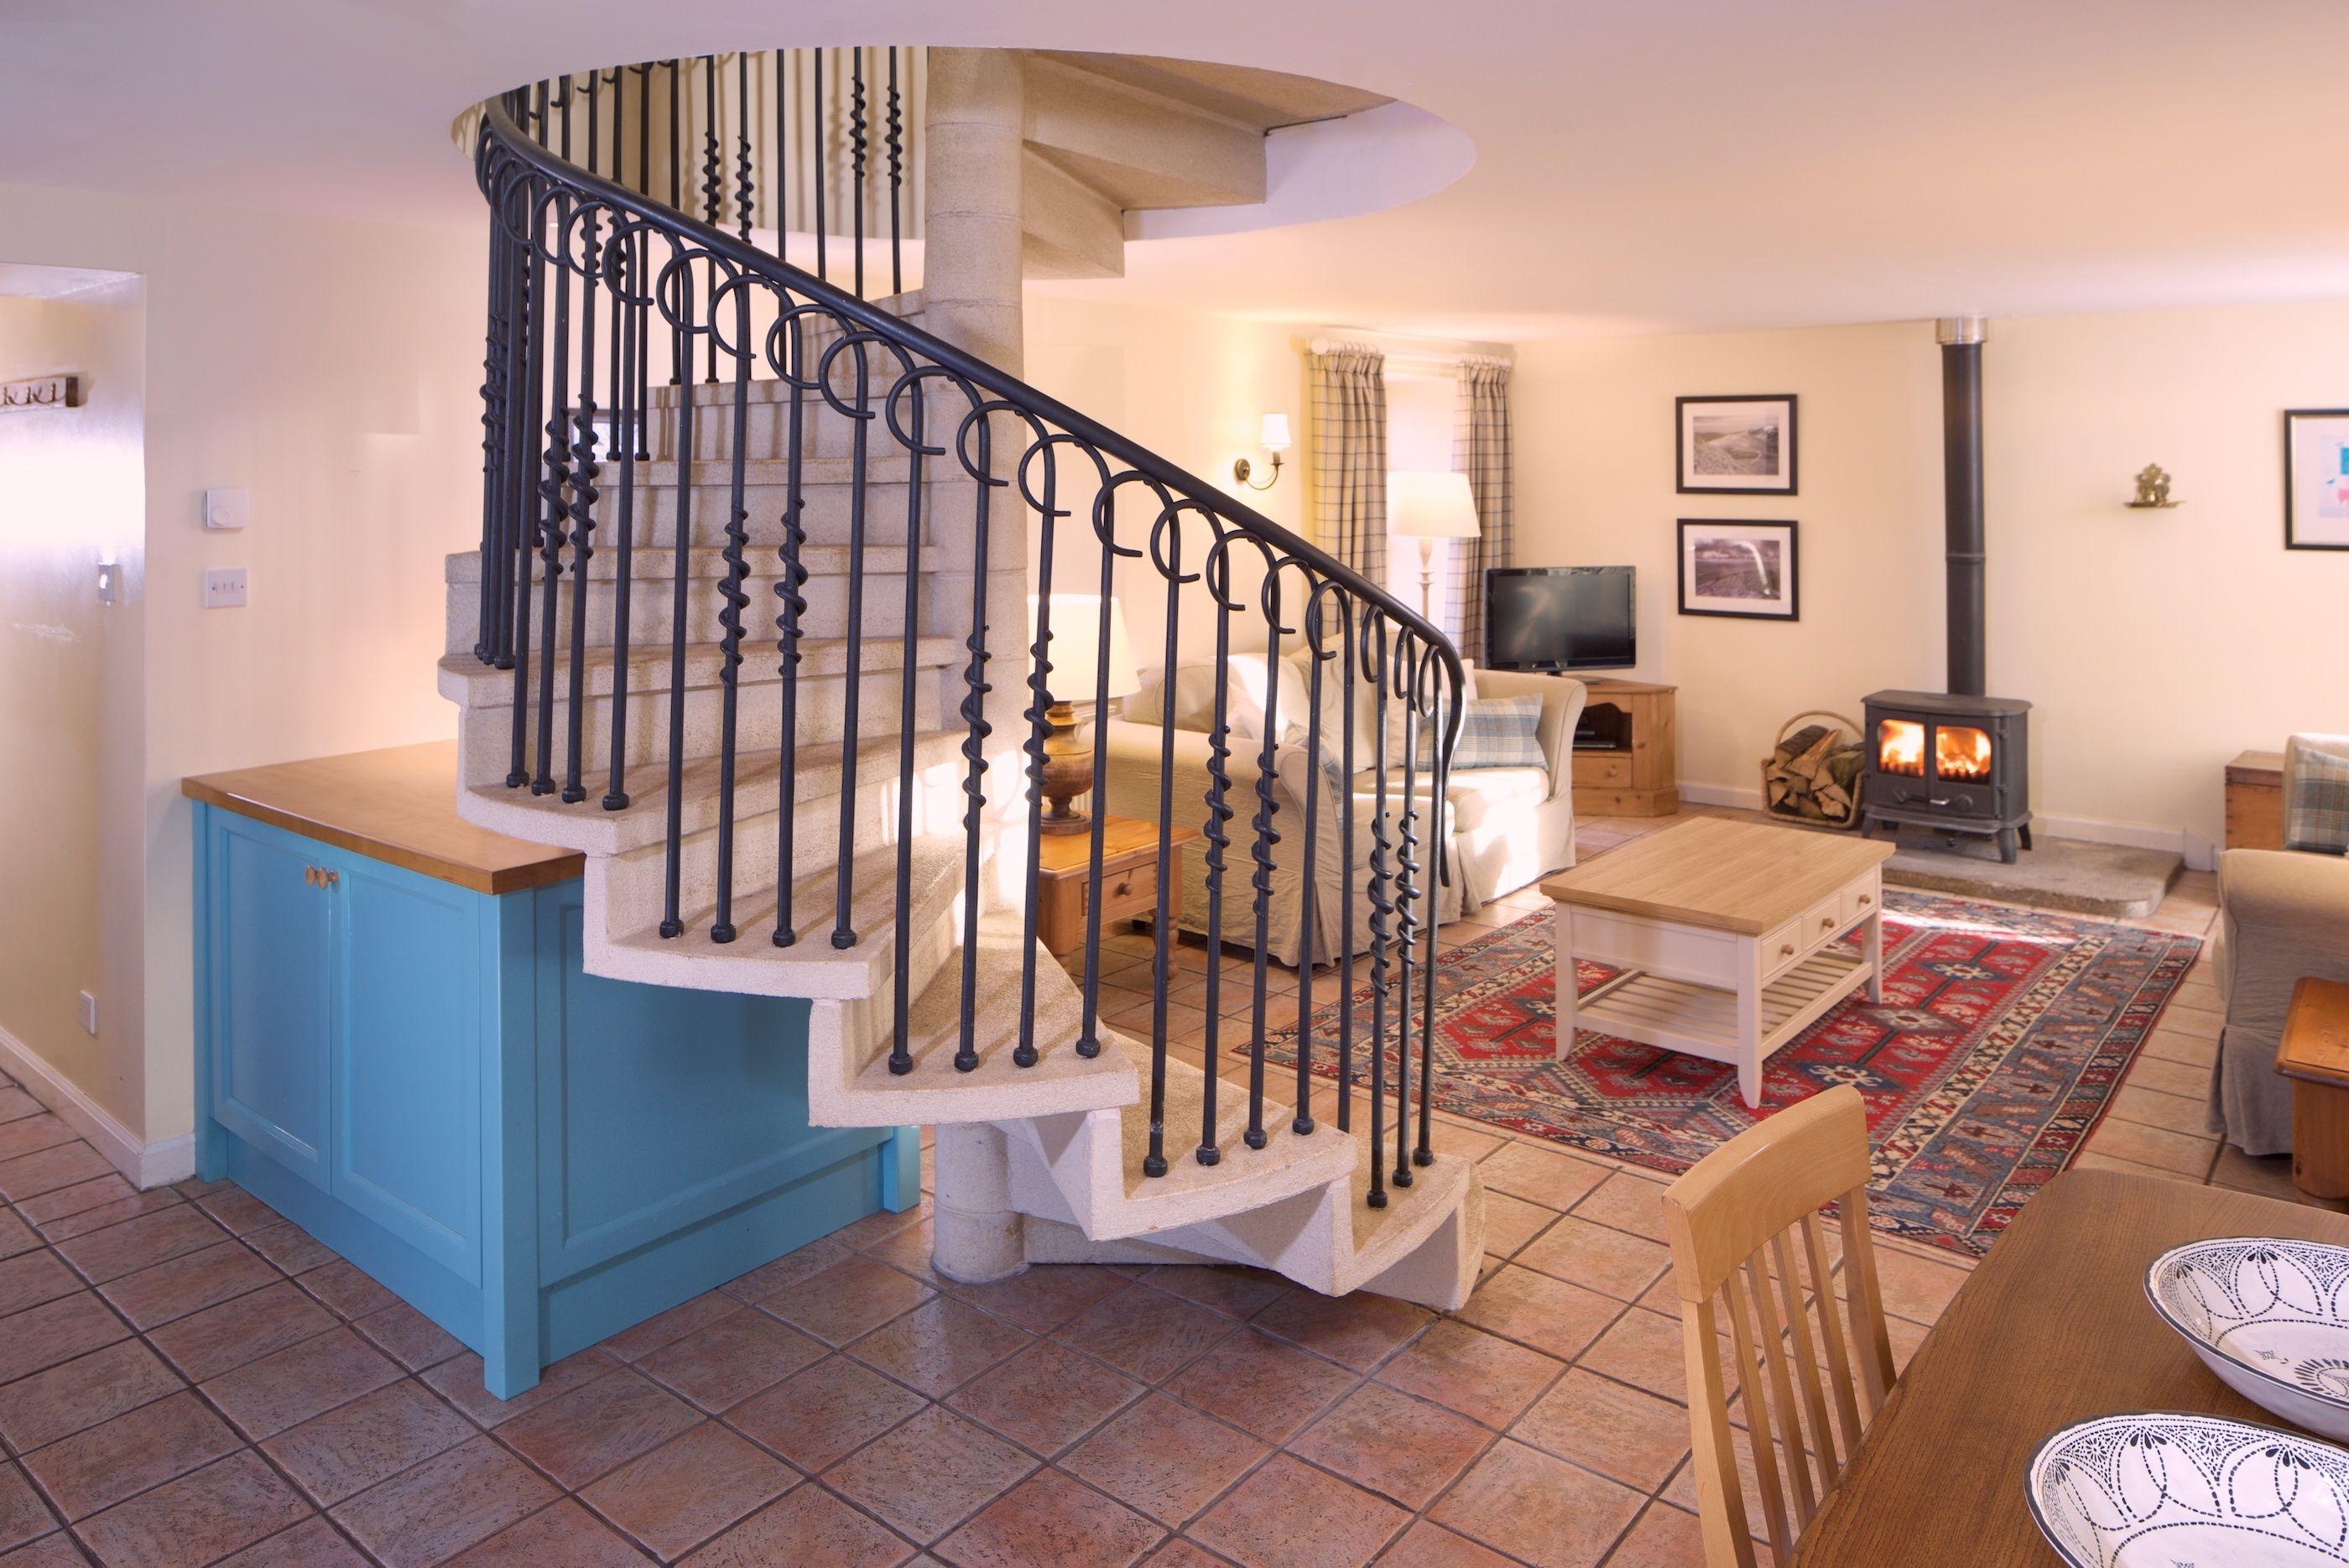 Luxury Hilltop Holiday Cottage In The Pentland Hills Regional Park Near Edinburgh Country